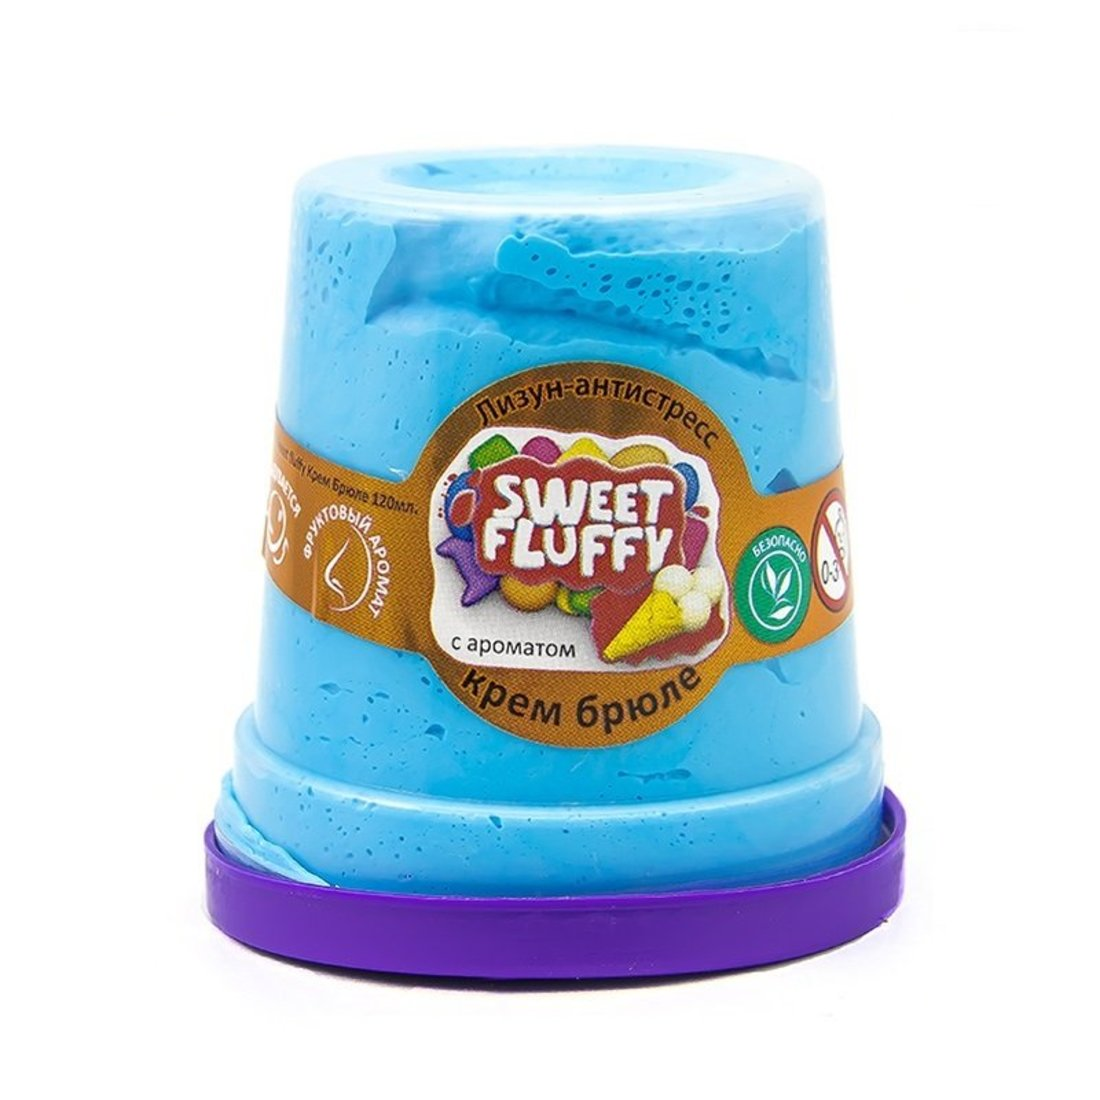 Слайм Mr.Boo Sweet fluffy Крем-брюле, 120 гр